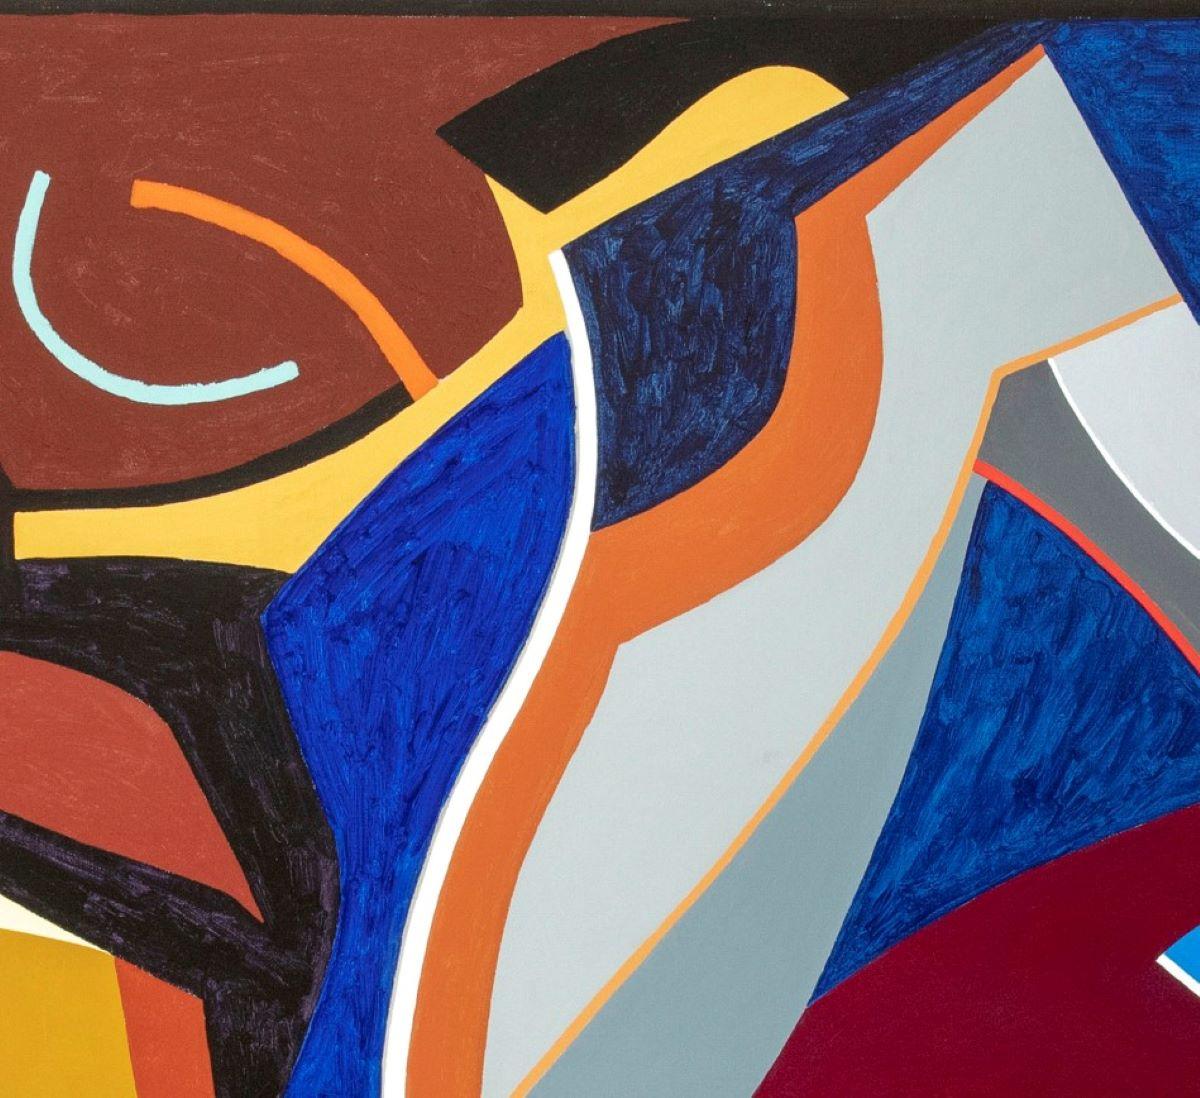 John Hitchens: Aspects of Landscapeat Southampton City Art Gallery